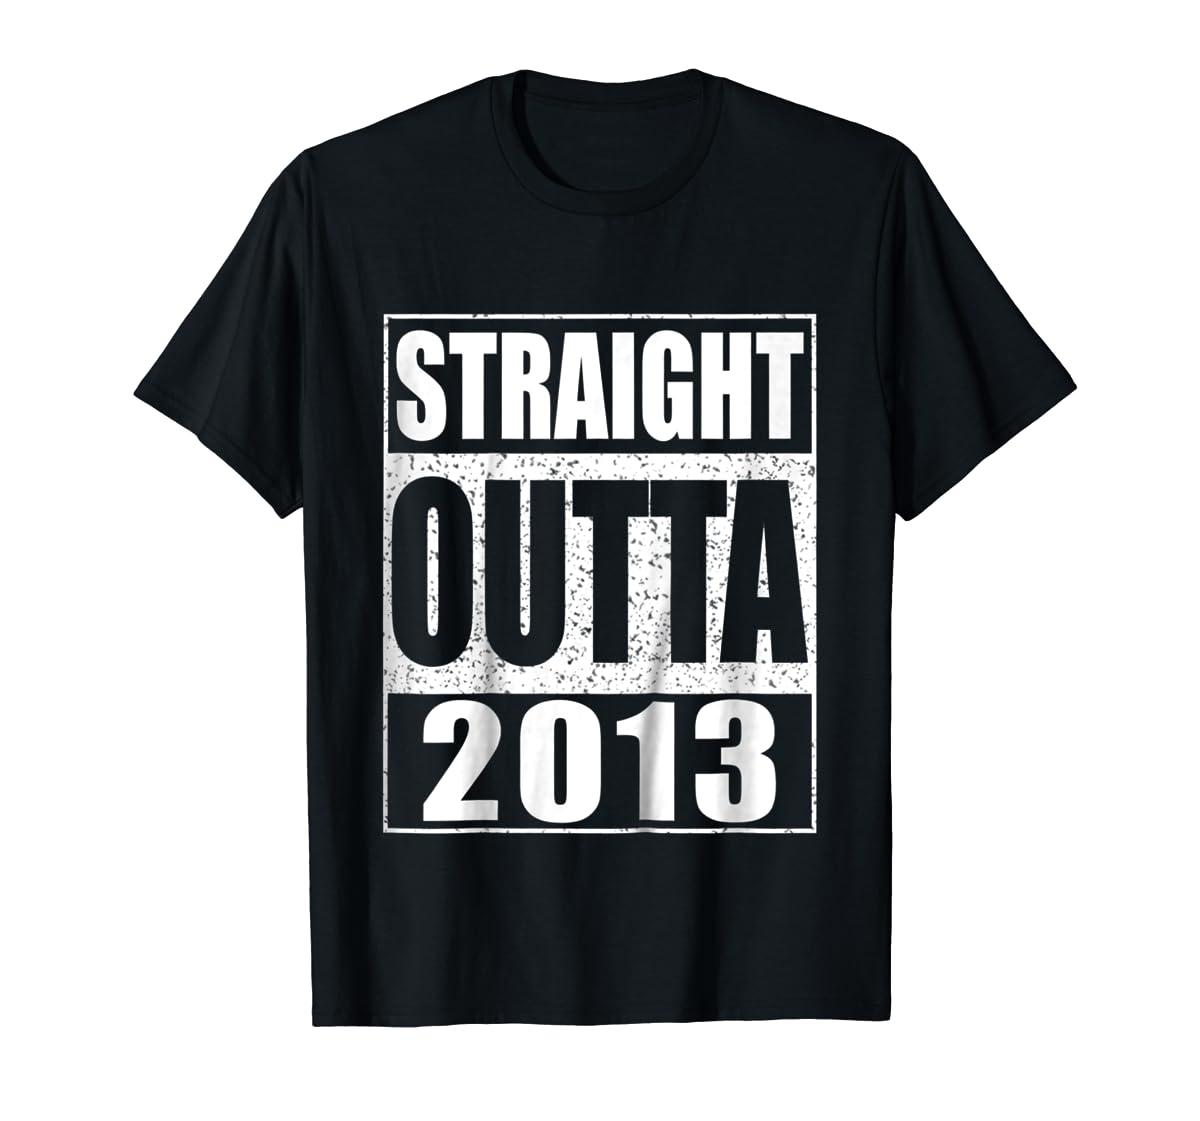 Kids Straight Outta 2013 T-Shirt 6th Birthday Gift Shirt-Men's T-Shirt-Black